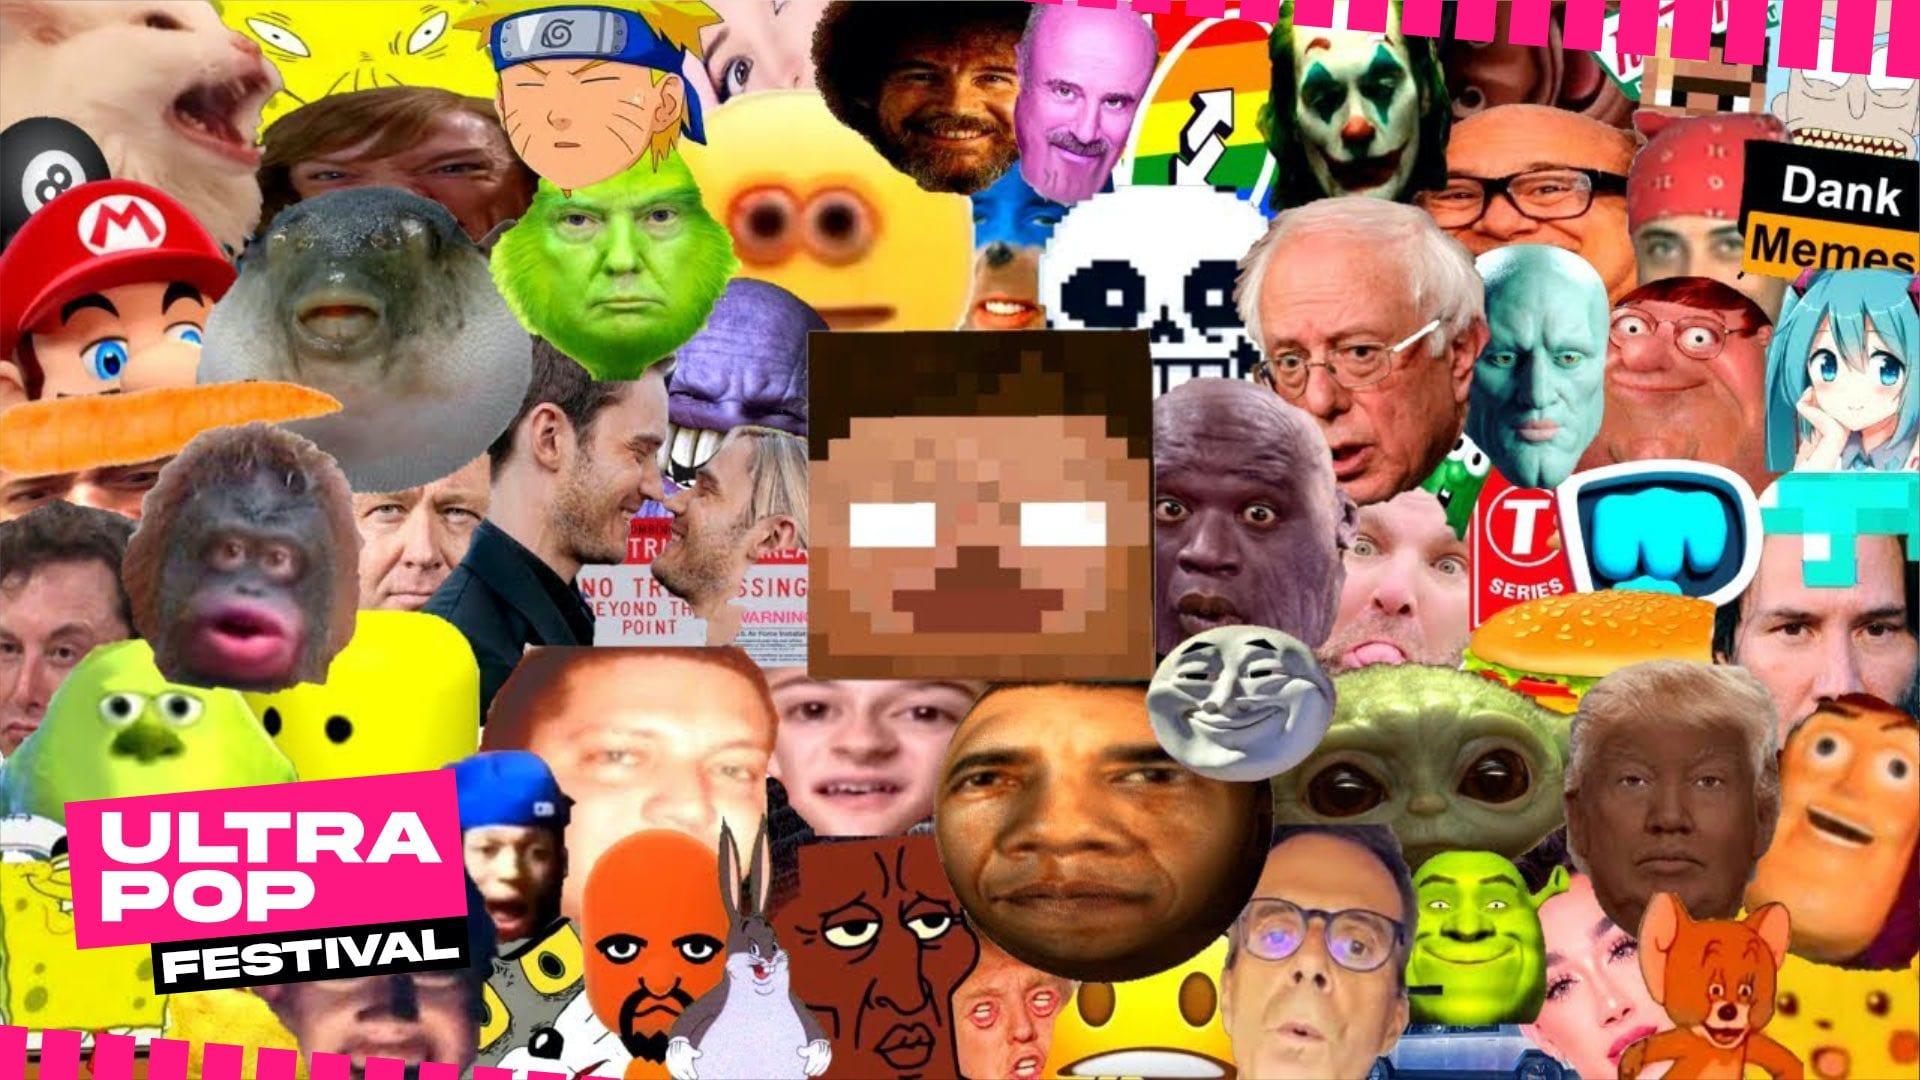 Pop of the Tops: Speciale Meme - UltraPop Festival 2020